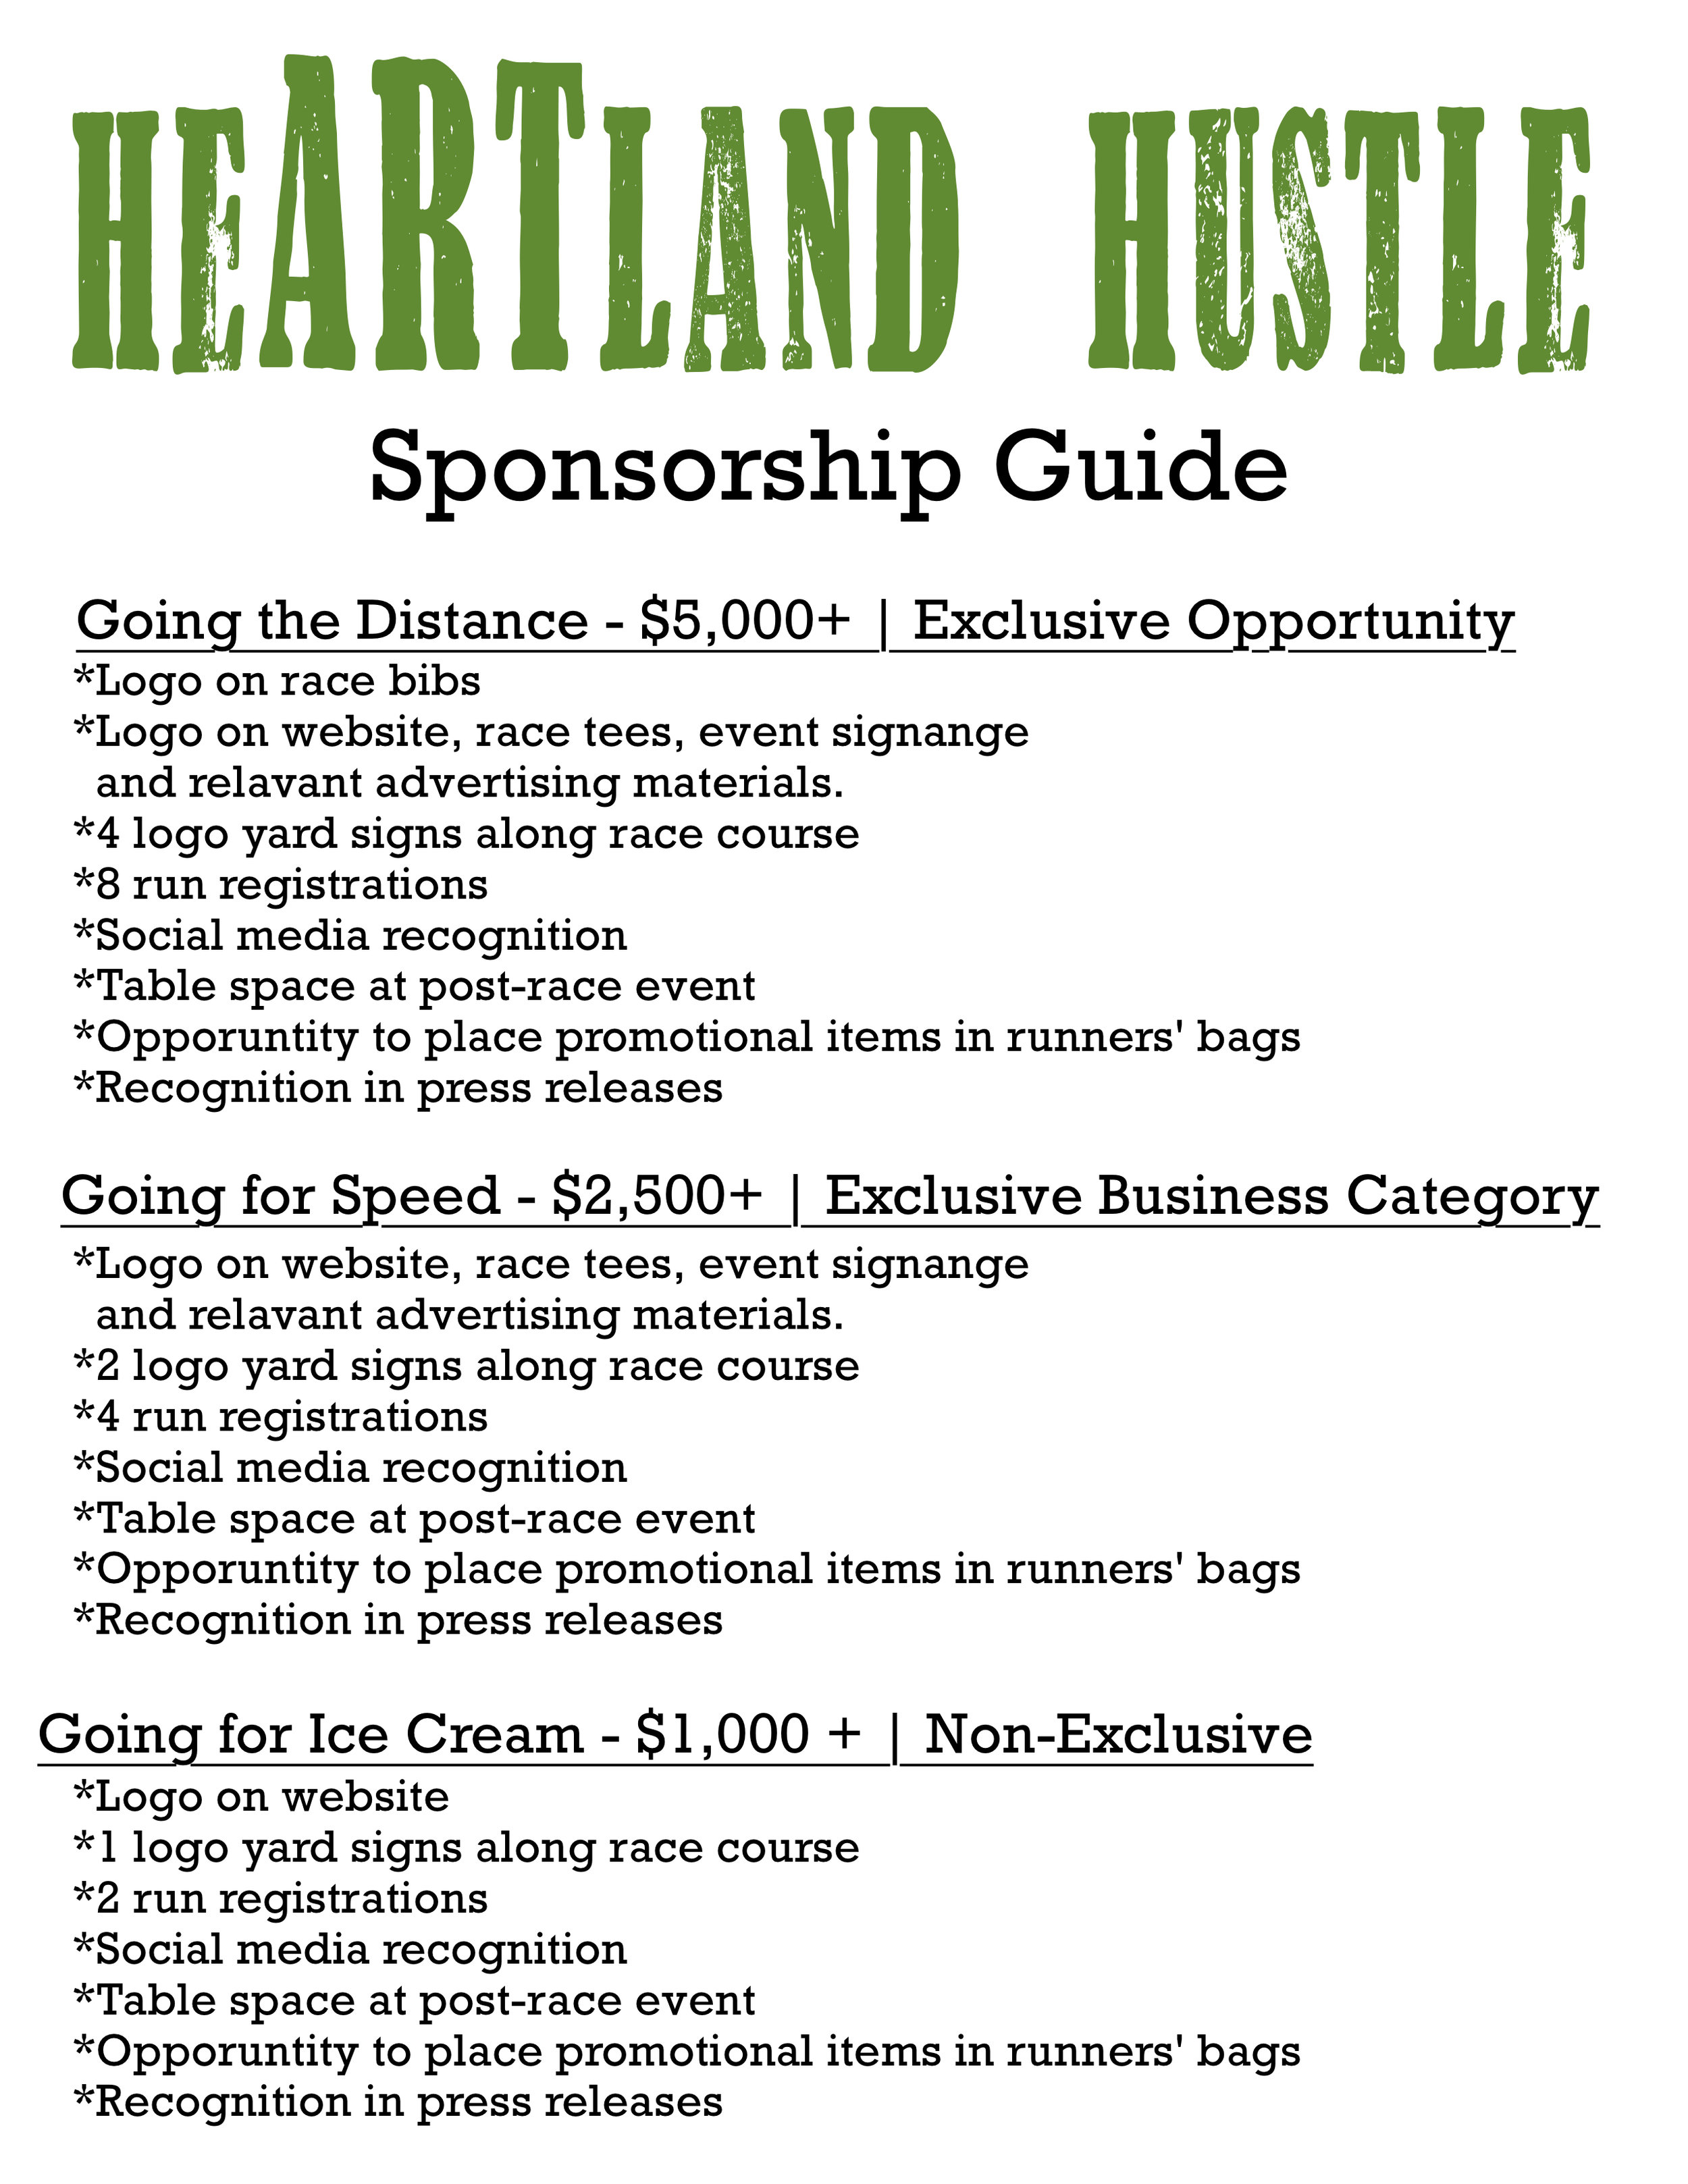 HeARTlandHustleSponsorshipGuide.jpg